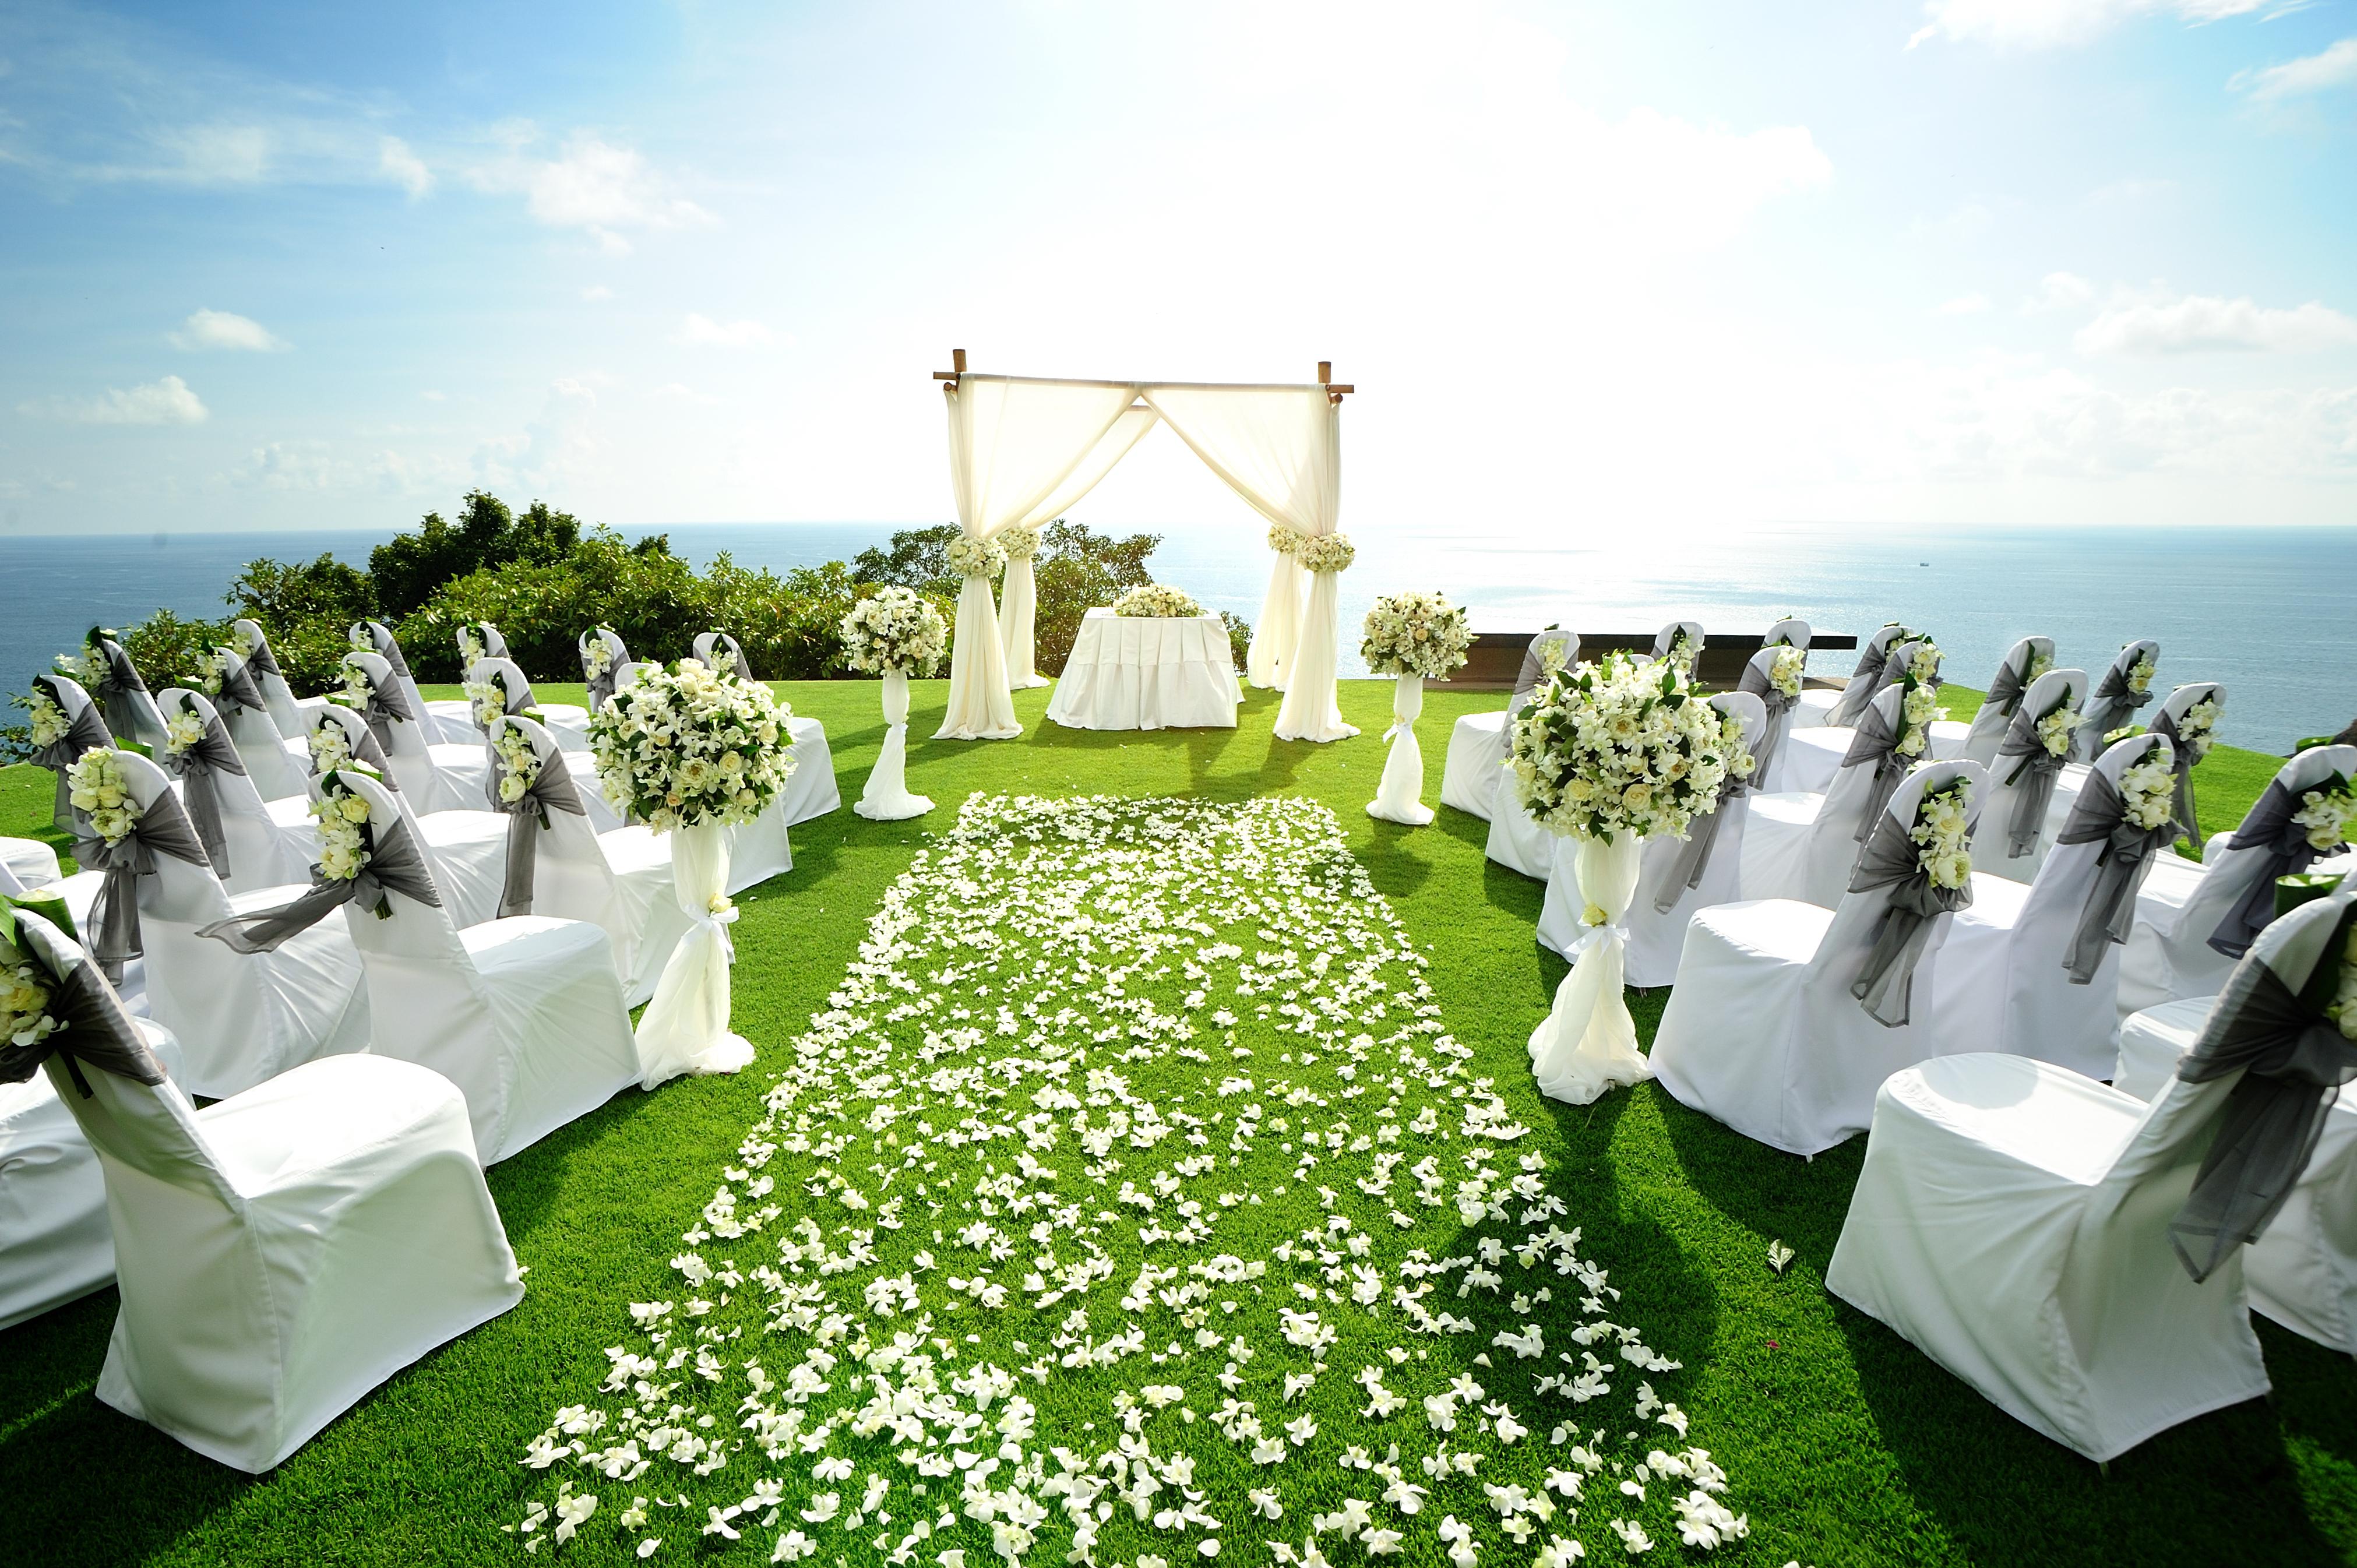 allee-ceremonie-mariage-exterieur